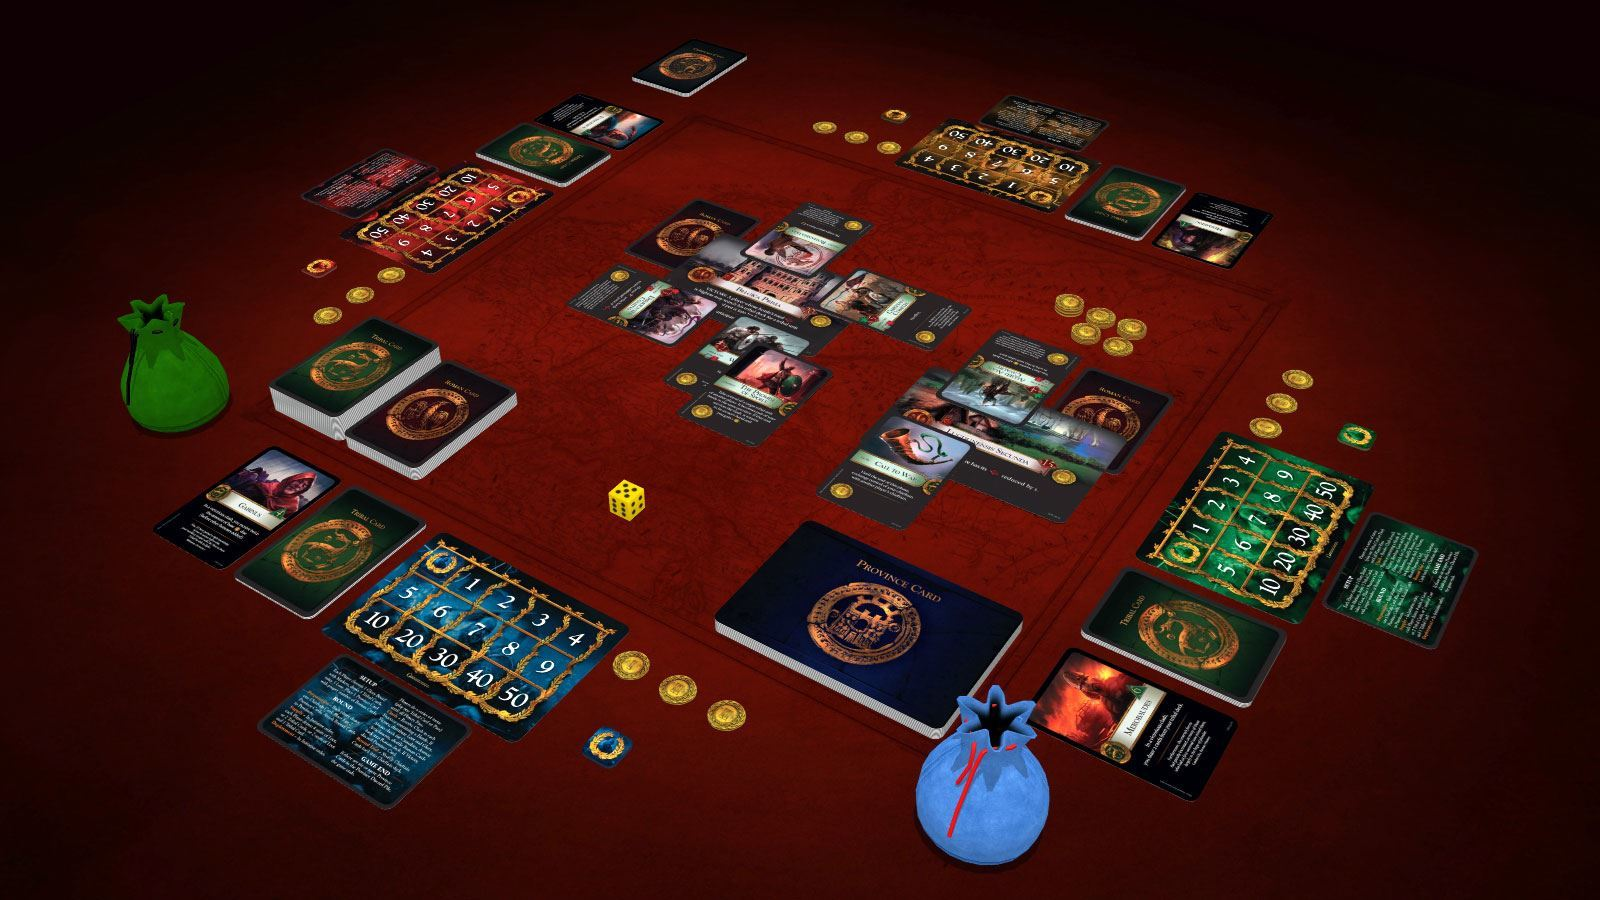 21 casino 50 free spins